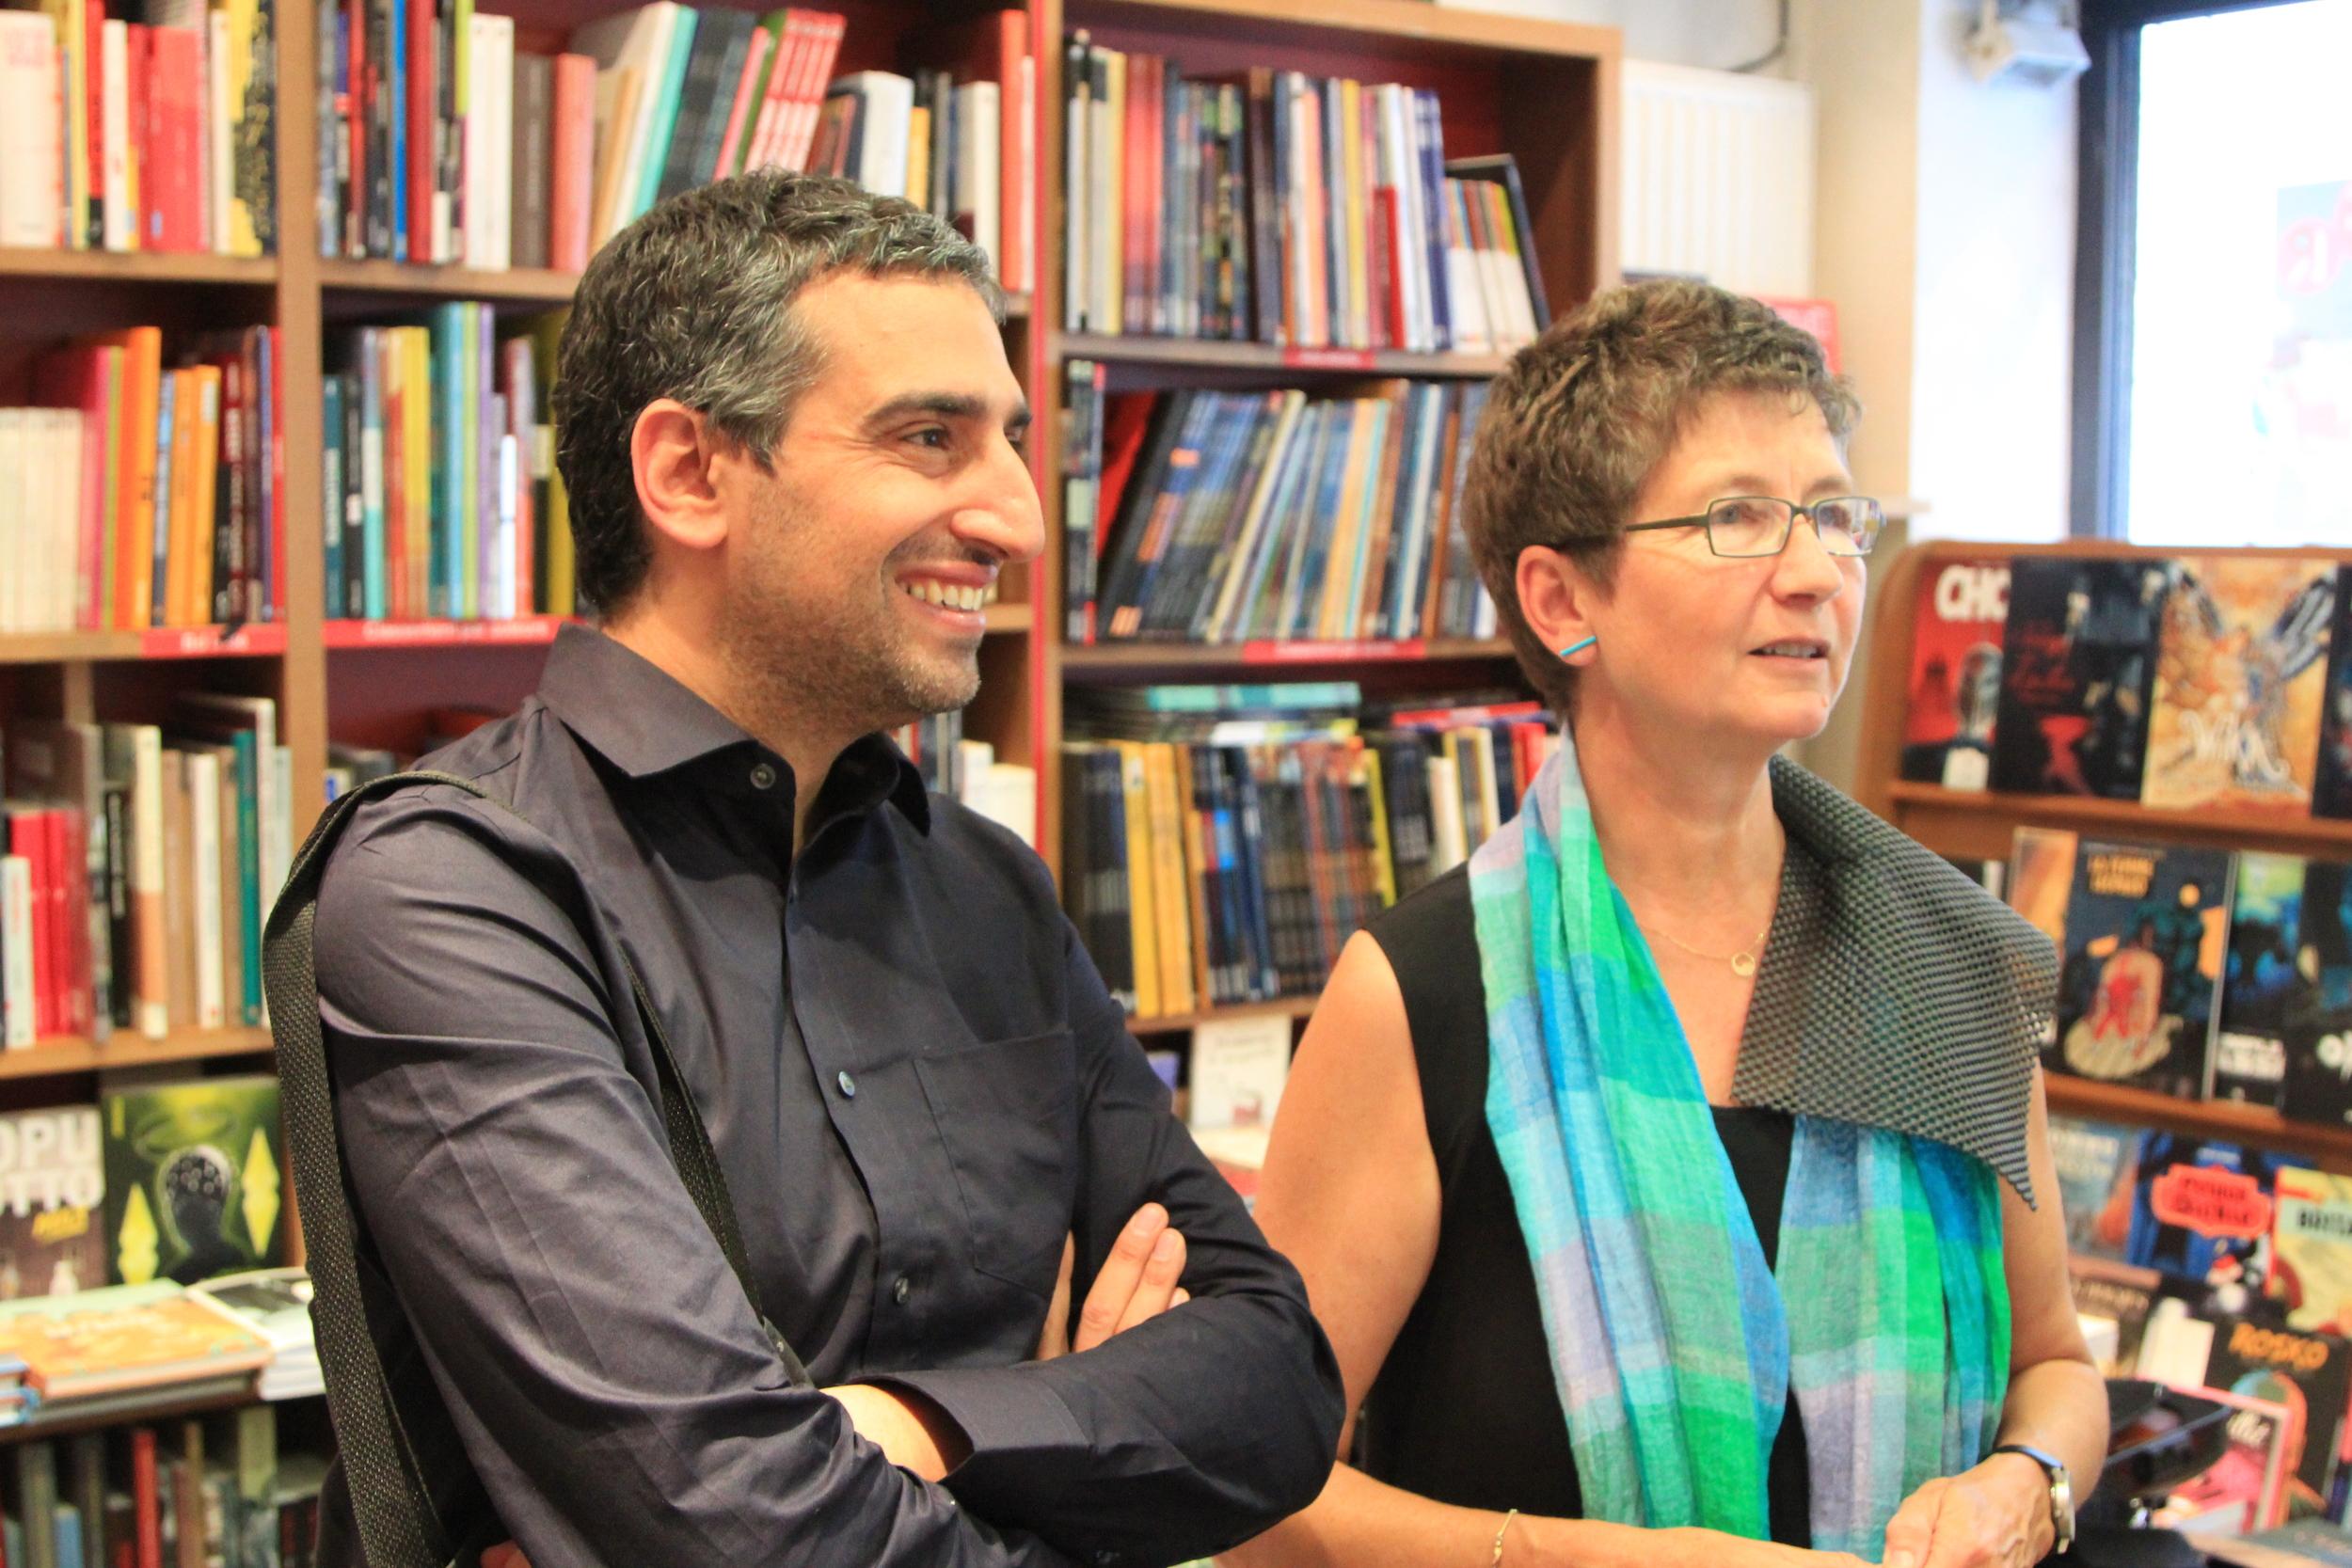 Daniel Medin and Maya Homburger at Le comptoir des mots. Photo: Dan Gunn.